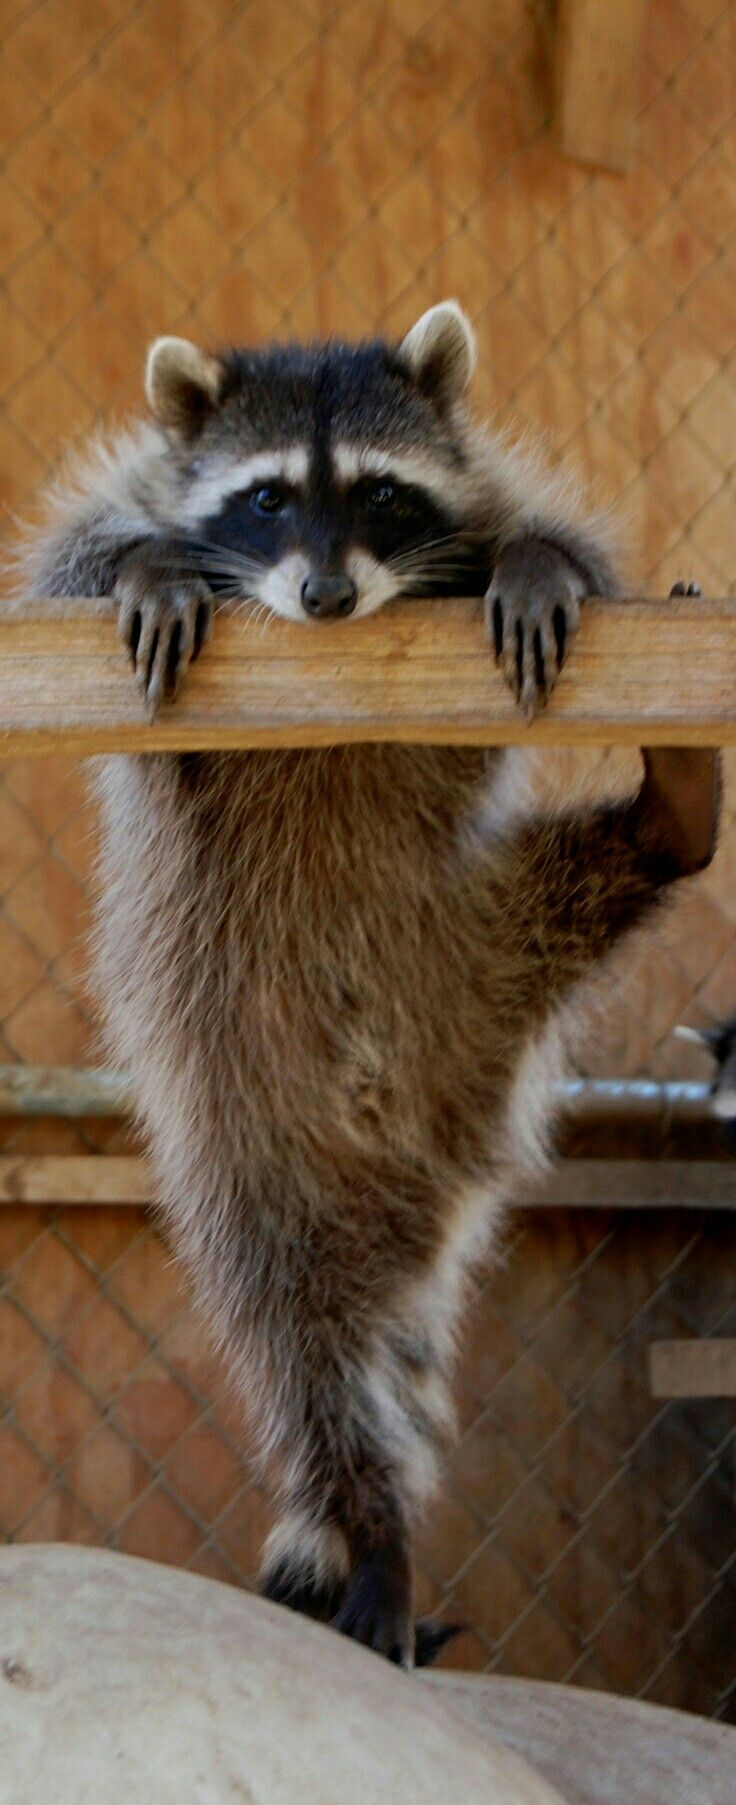 The 59 best Ranger Rick images on Pinterest | Adorable animals ...